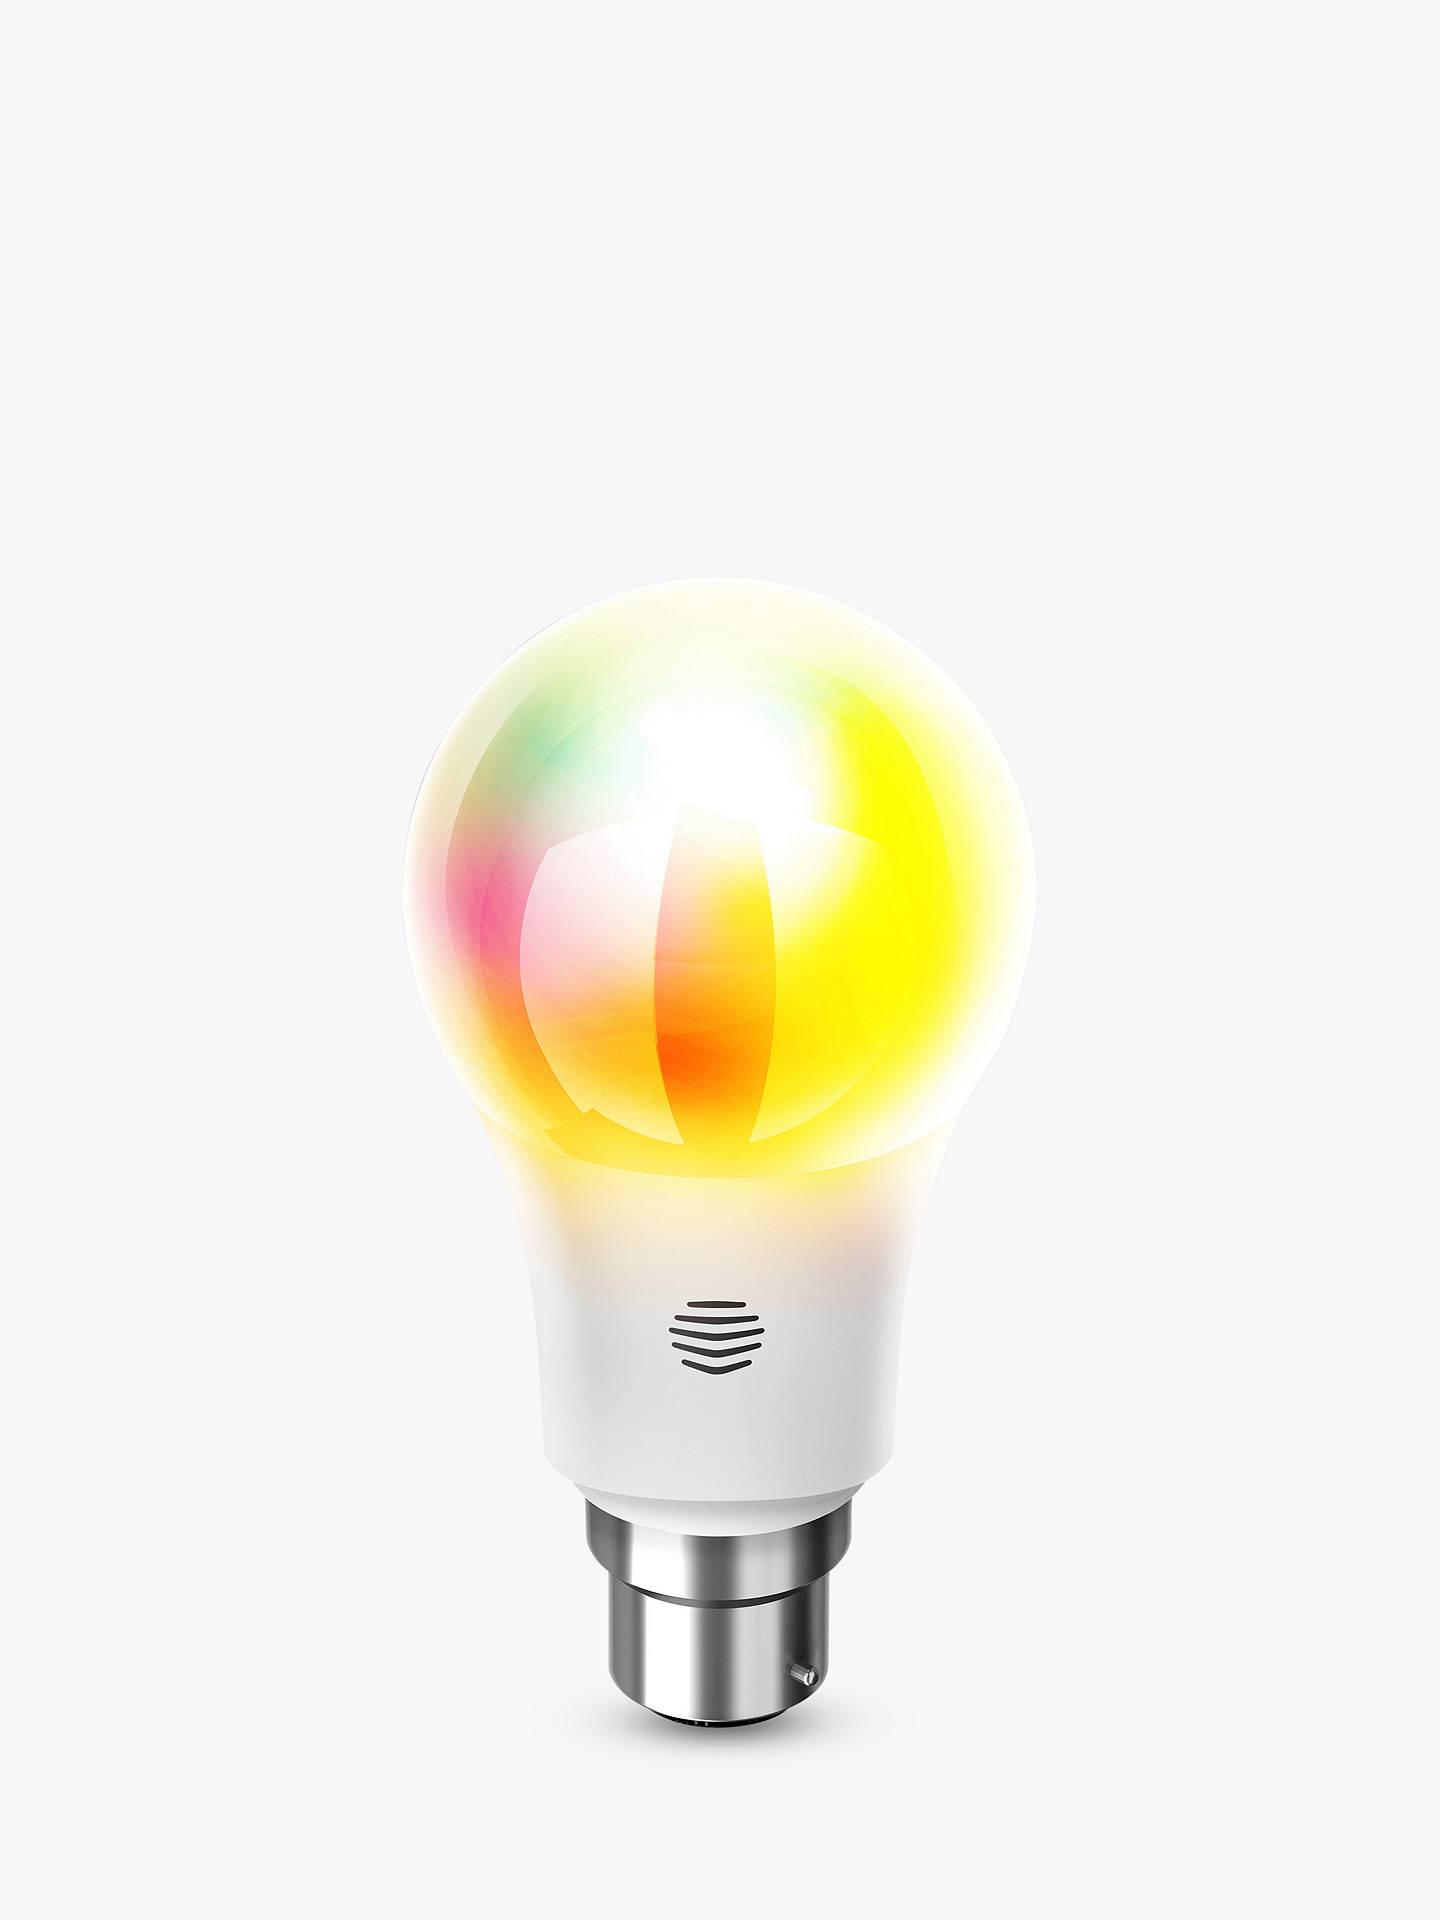 hive active light colour changing wireless lighting led. Black Bedroom Furniture Sets. Home Design Ideas